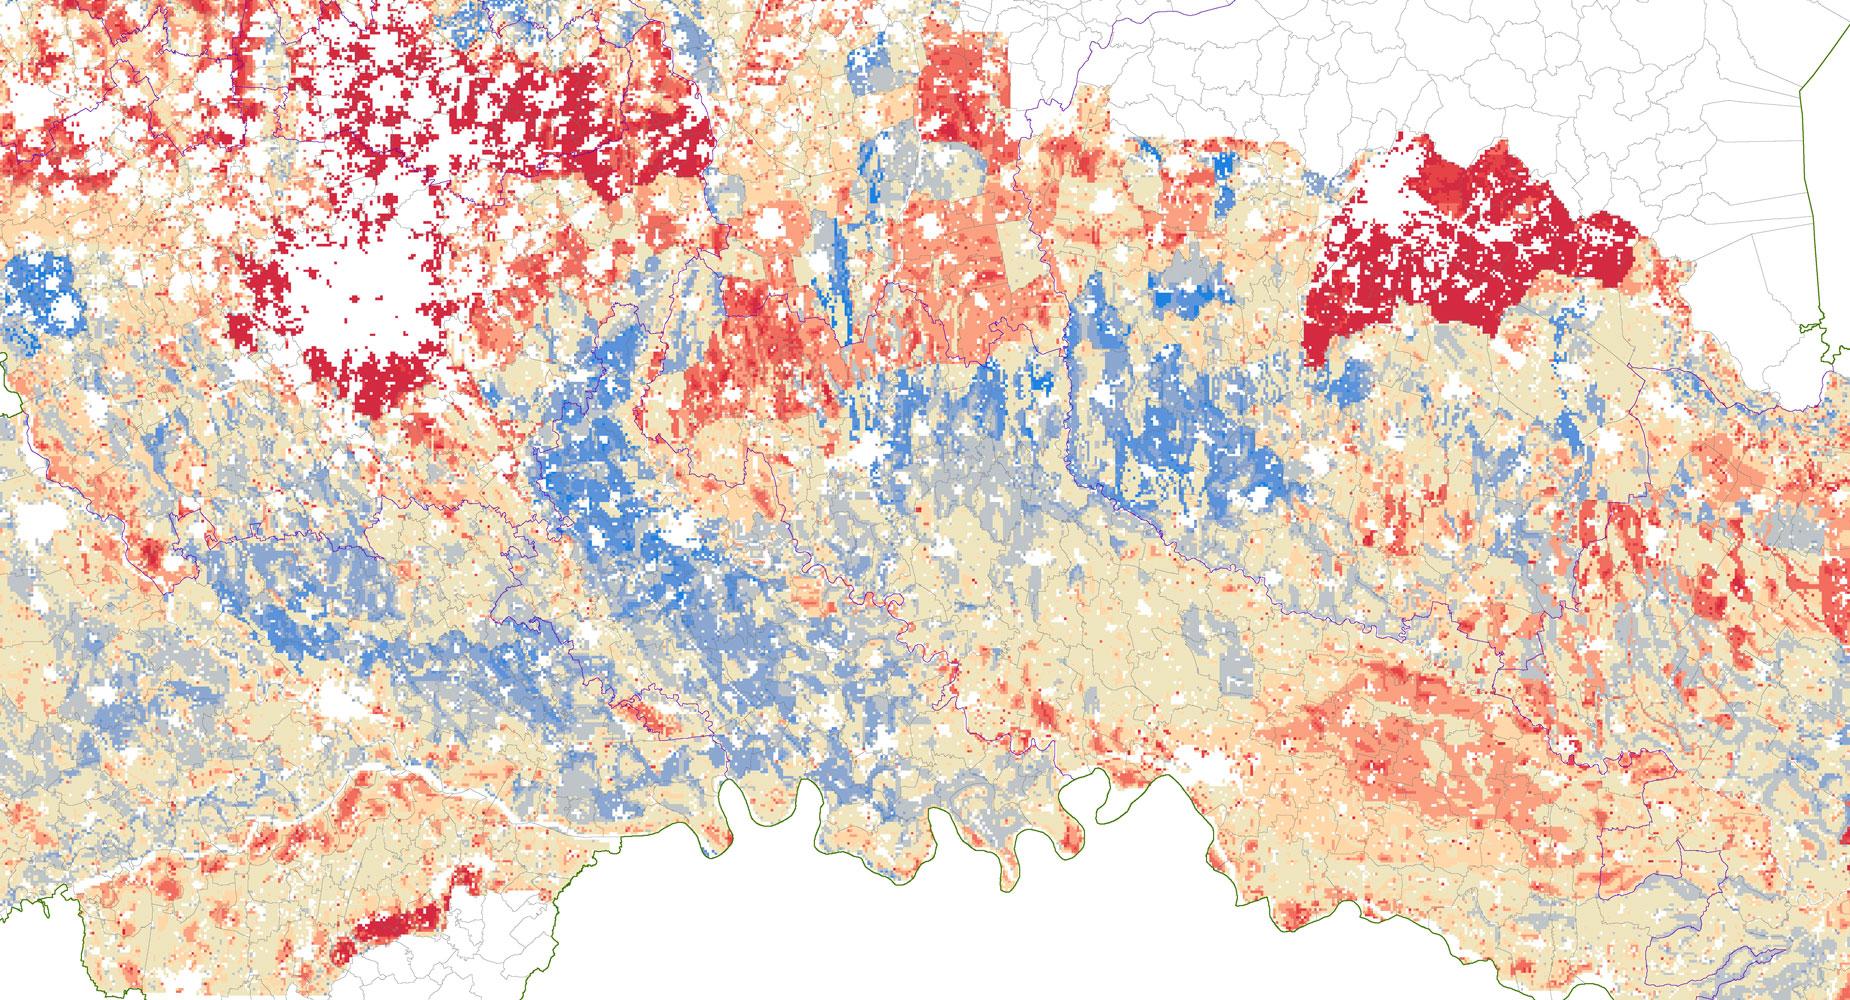 Tethys srl Milano - GIS e WEBGIS